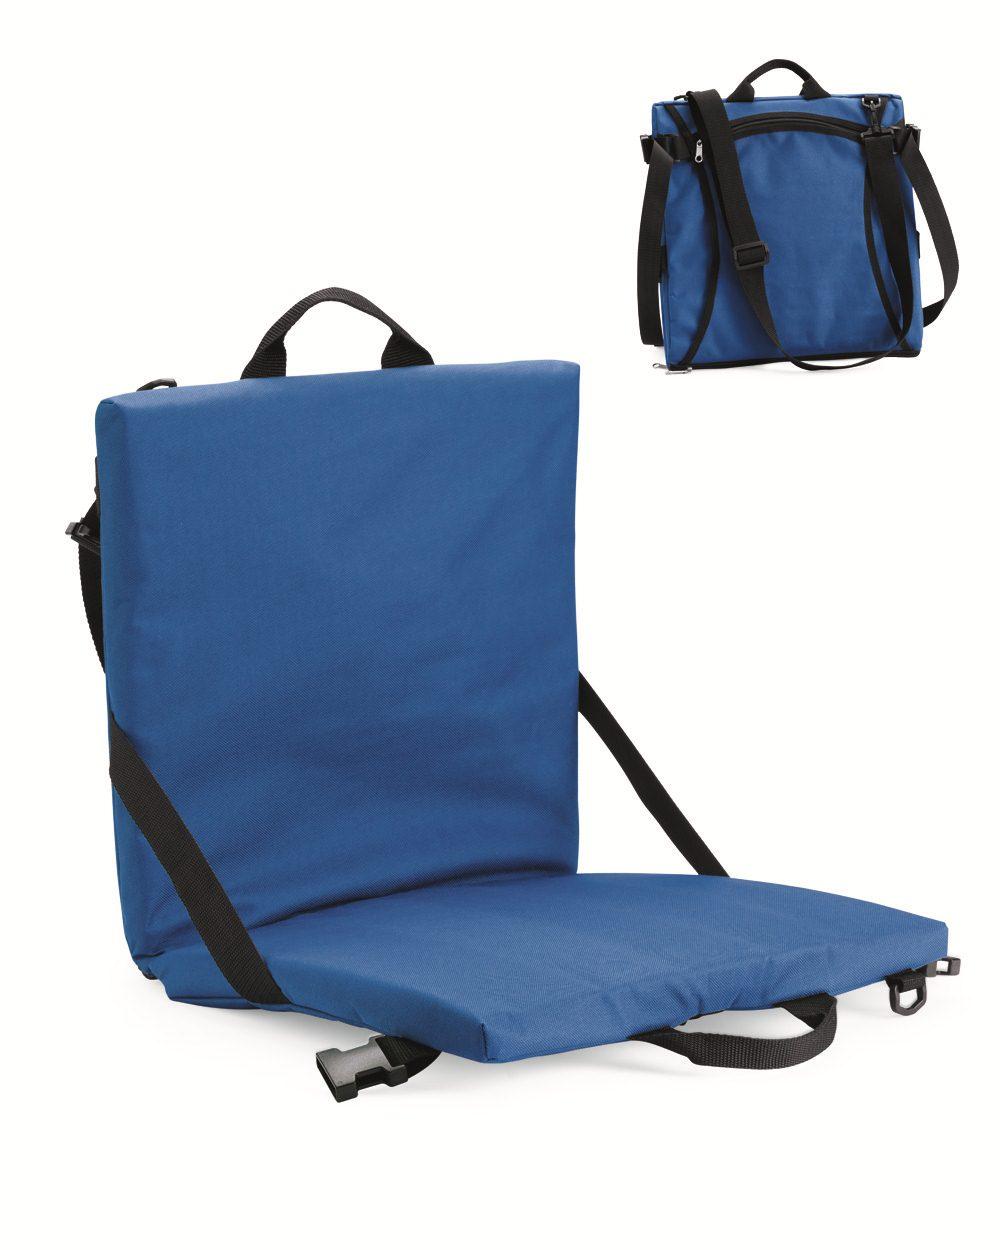 Liberty Bags Folding Stadium Seat - FT006